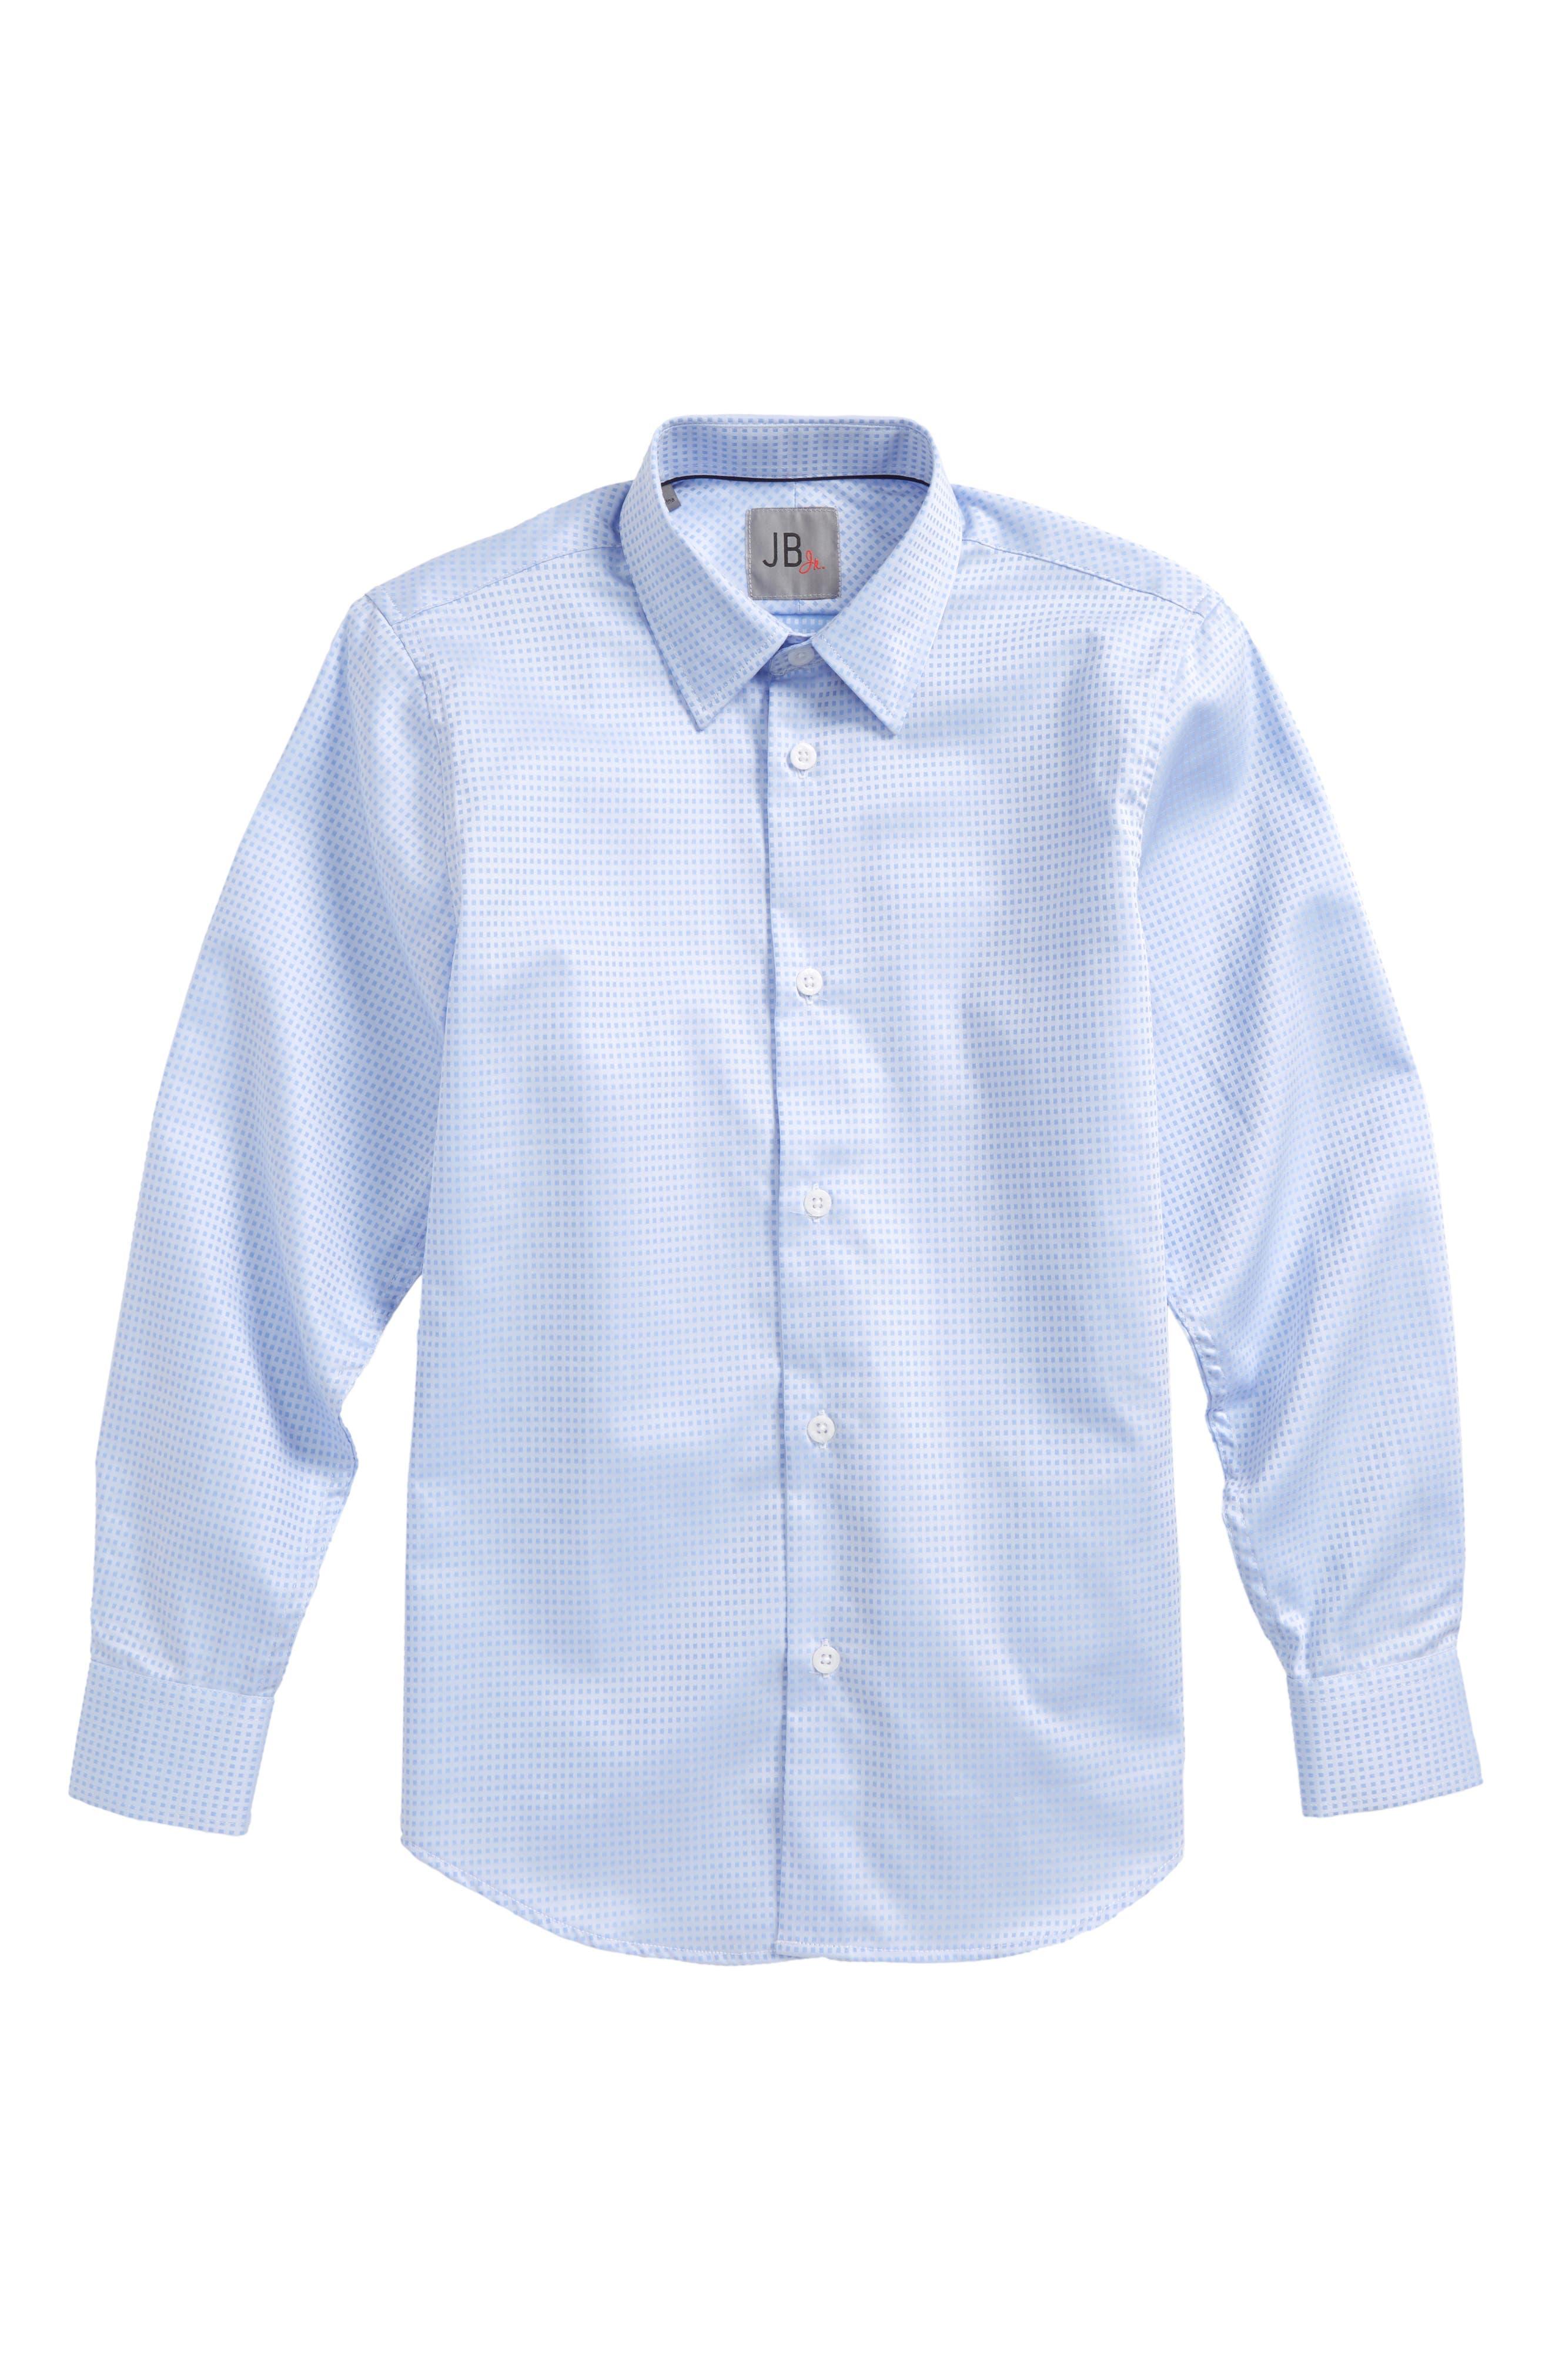 Microcheck Dress Shirt,                             Main thumbnail 1, color,                             Lt Blue Check